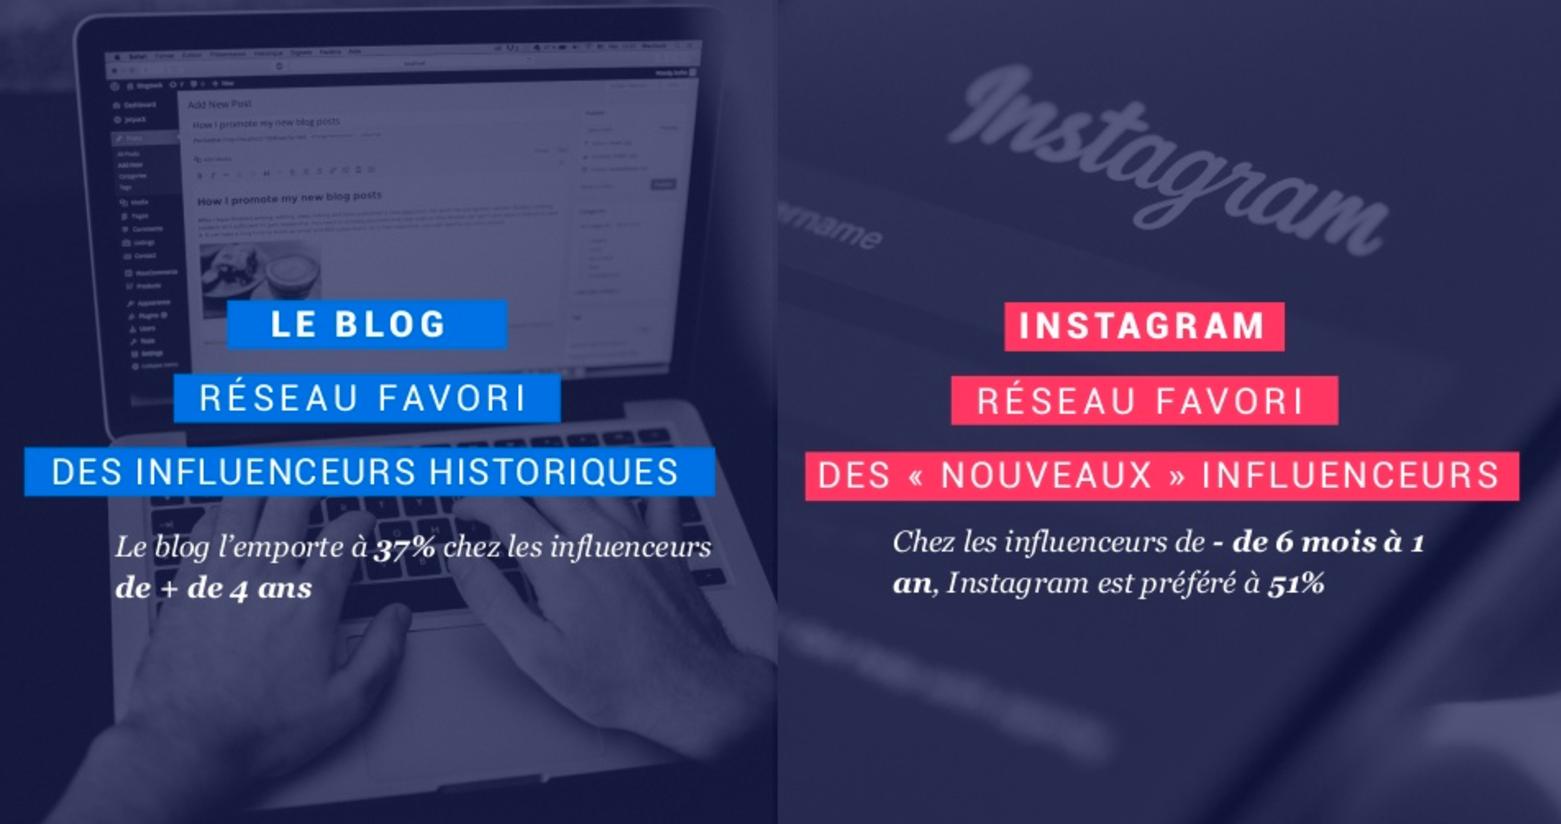 etude-influenceurs-marque-reech-blog-instagram